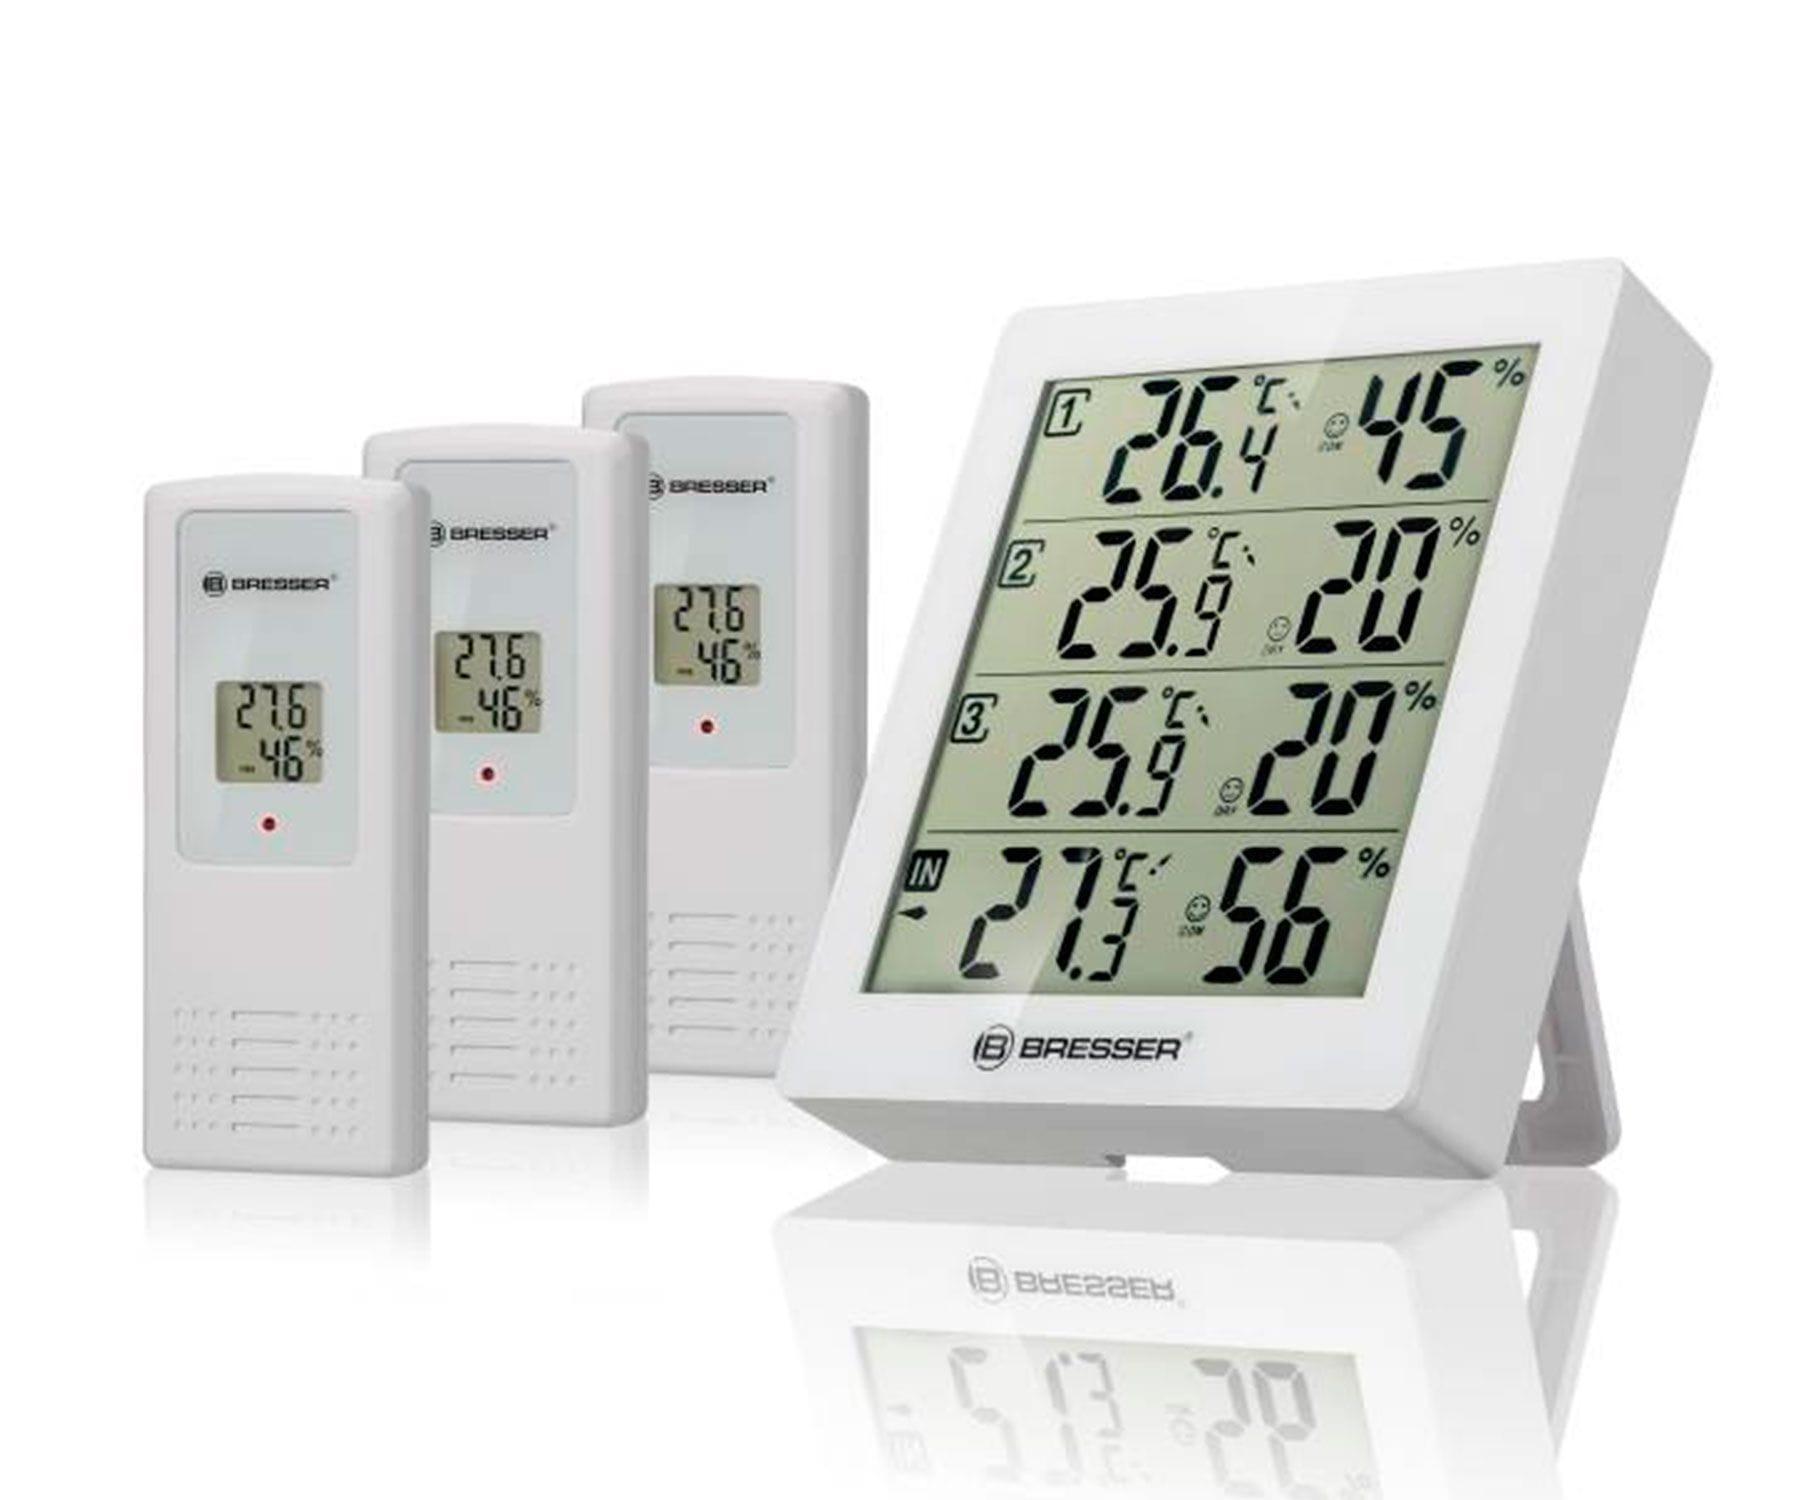 Bresser Temeo Hygro Quadro Blanco/Estación meteorológica + 3 sensores